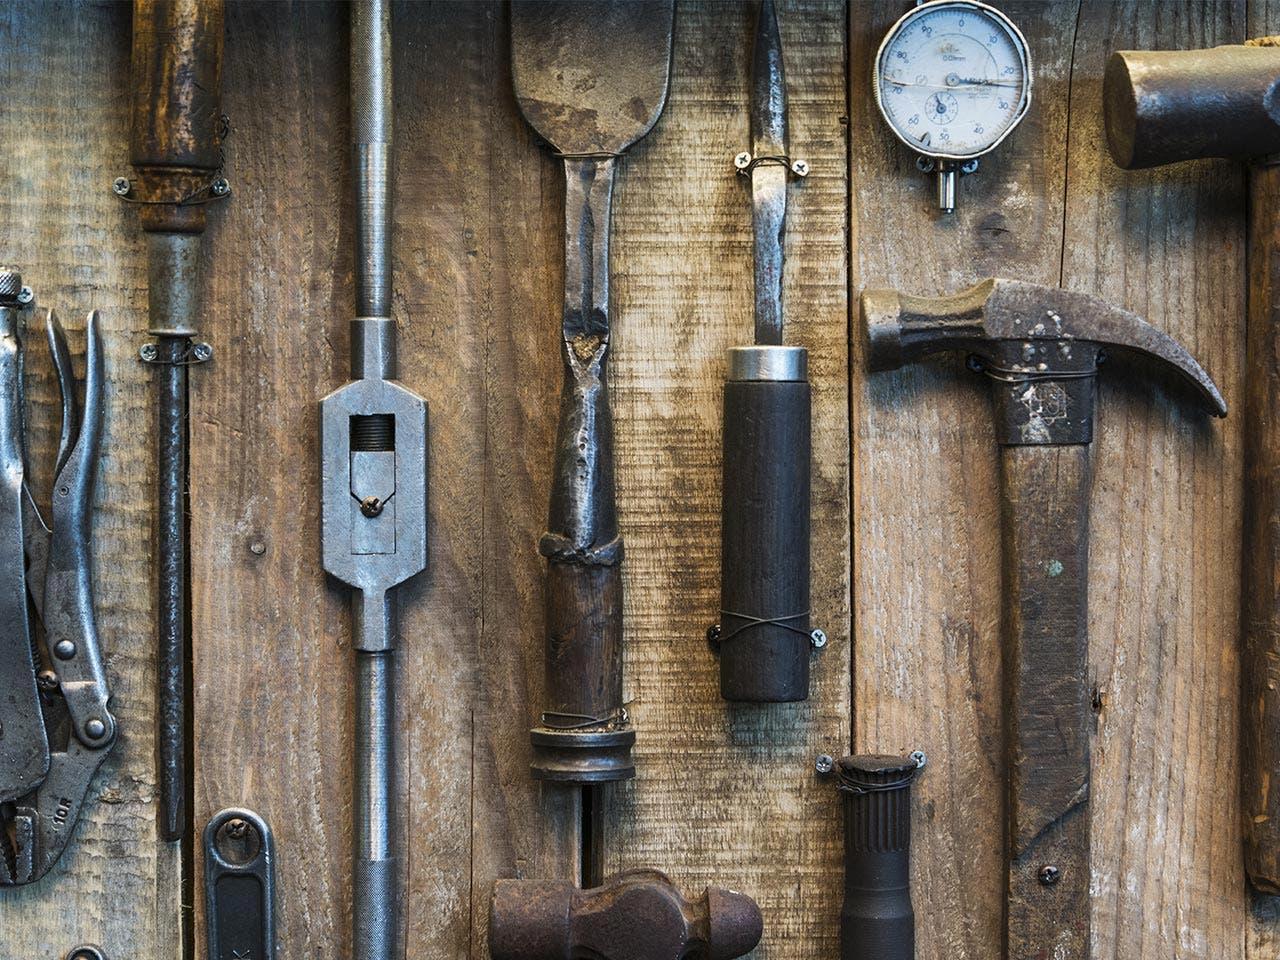 Tools | yoojiwhan/Shutterstock.com